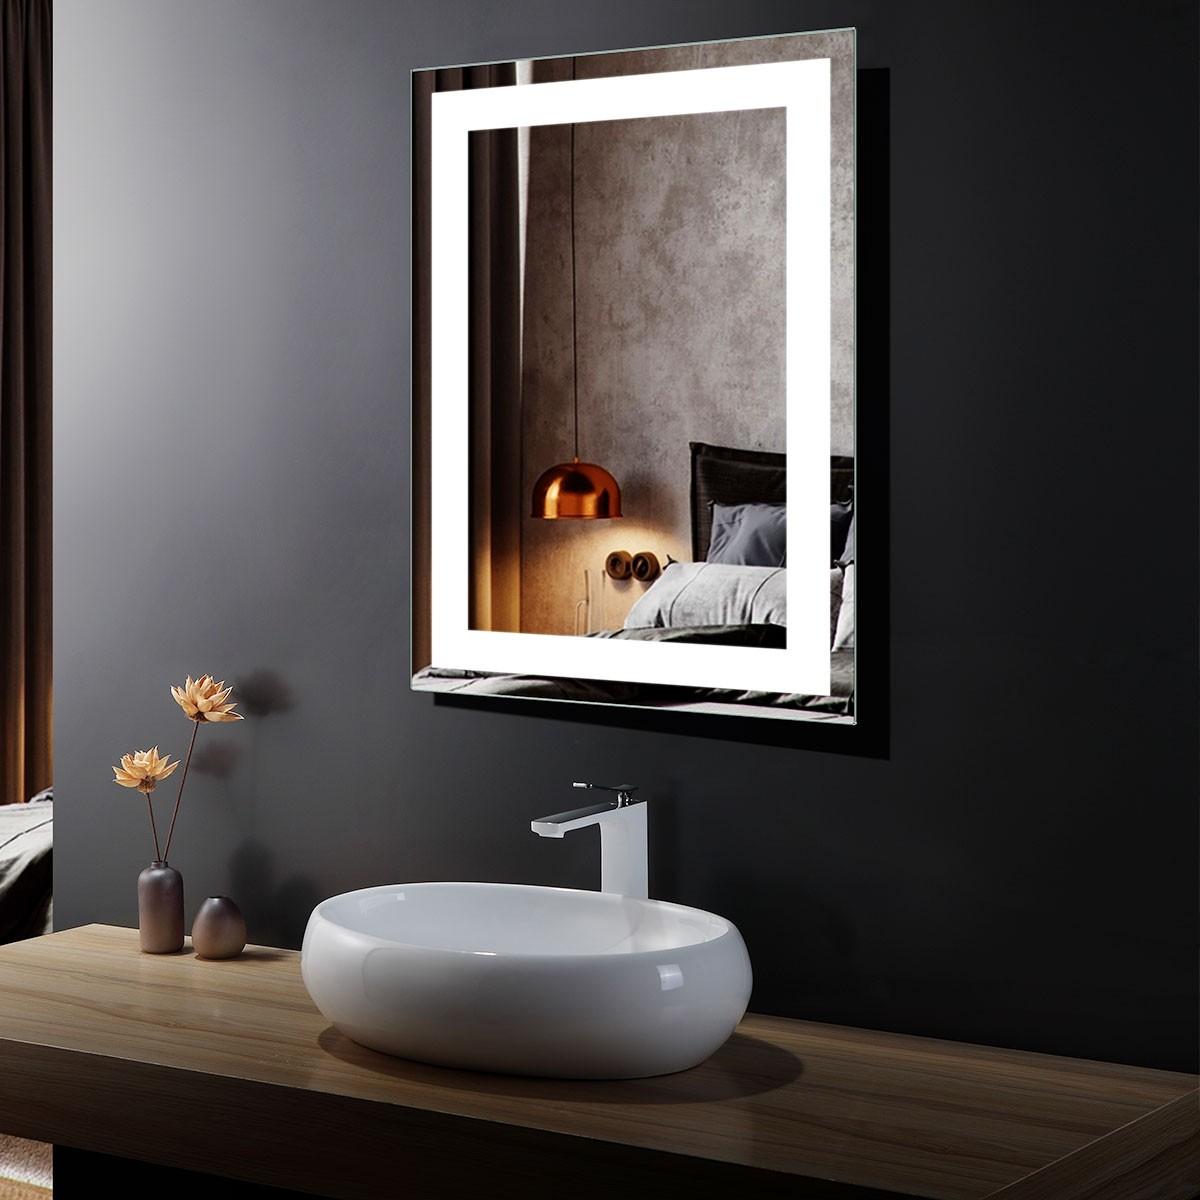 DECORAPORT 24 x 32 In LED Bathroom Mirror with Infrared Sensor Control, Anti-Fog, Vertical & Horizontal Mount (CG15-2432)